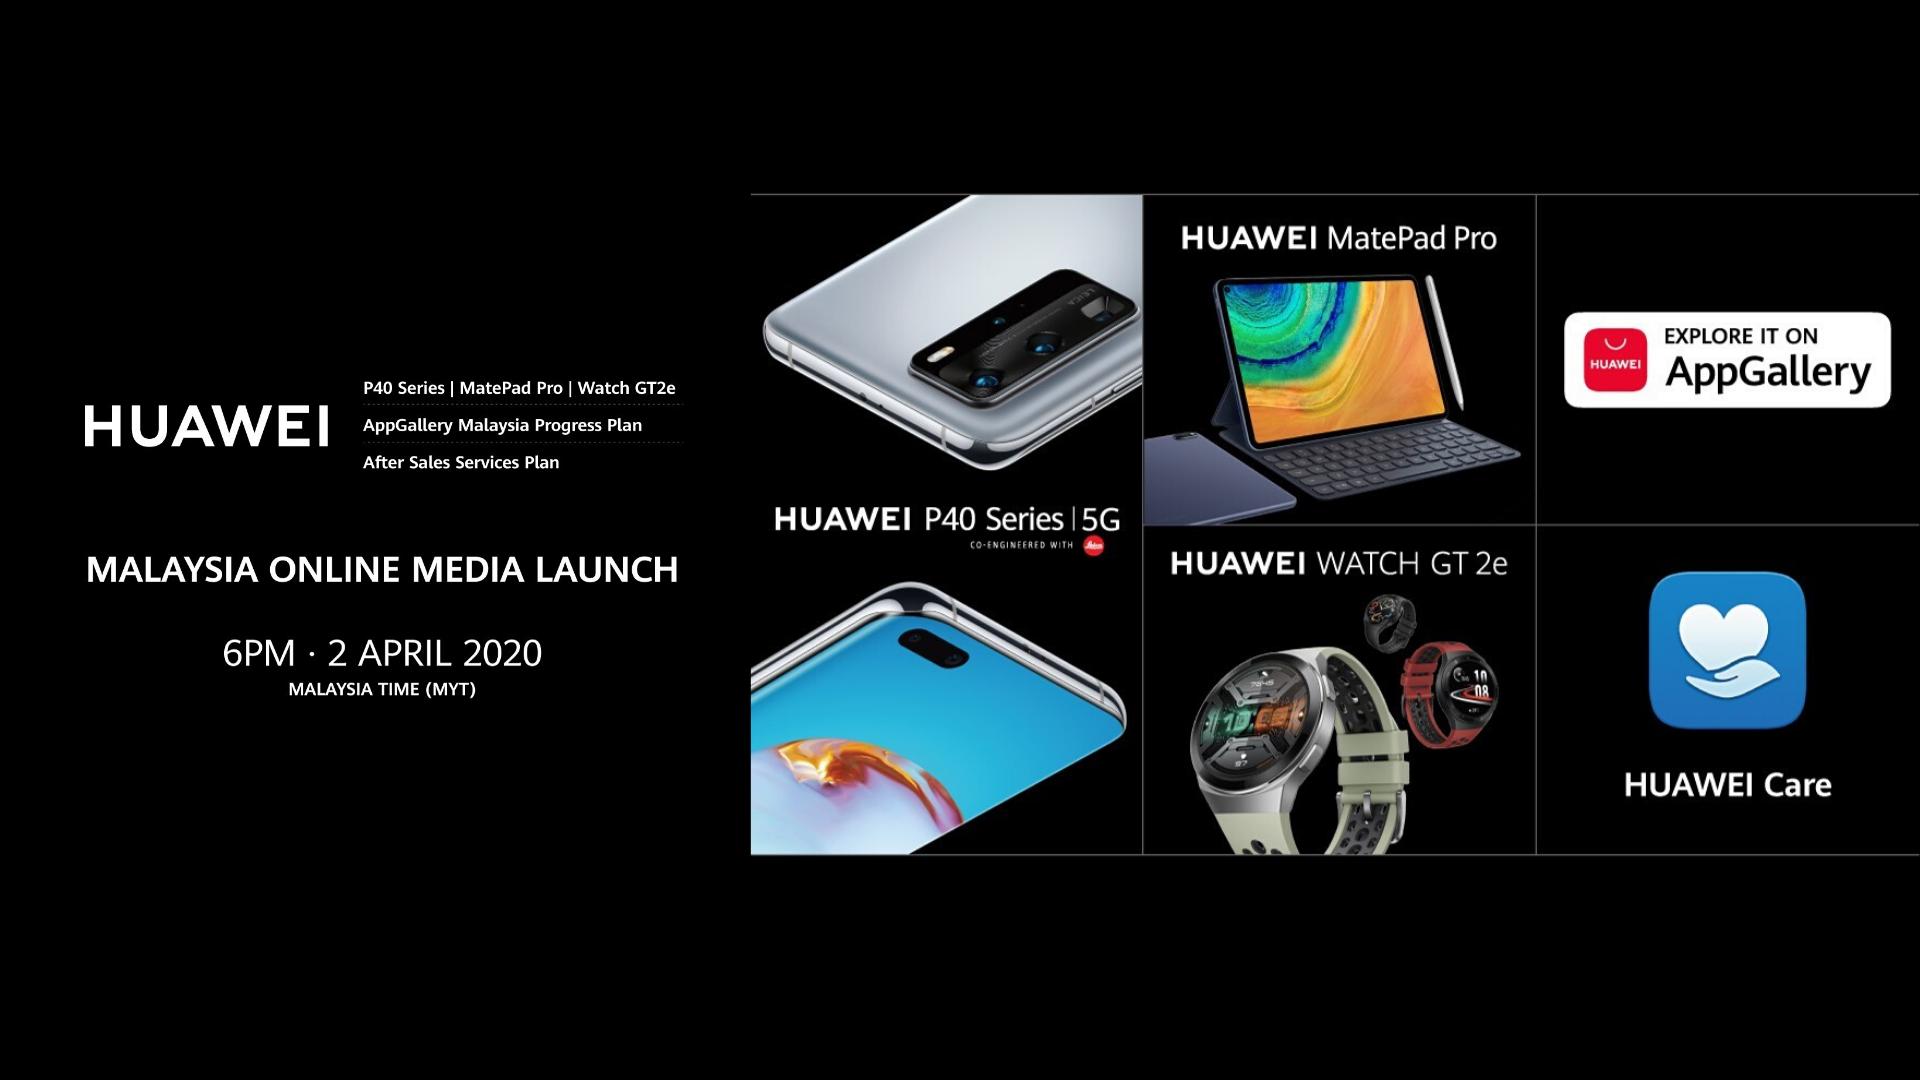 Huawei online media launch